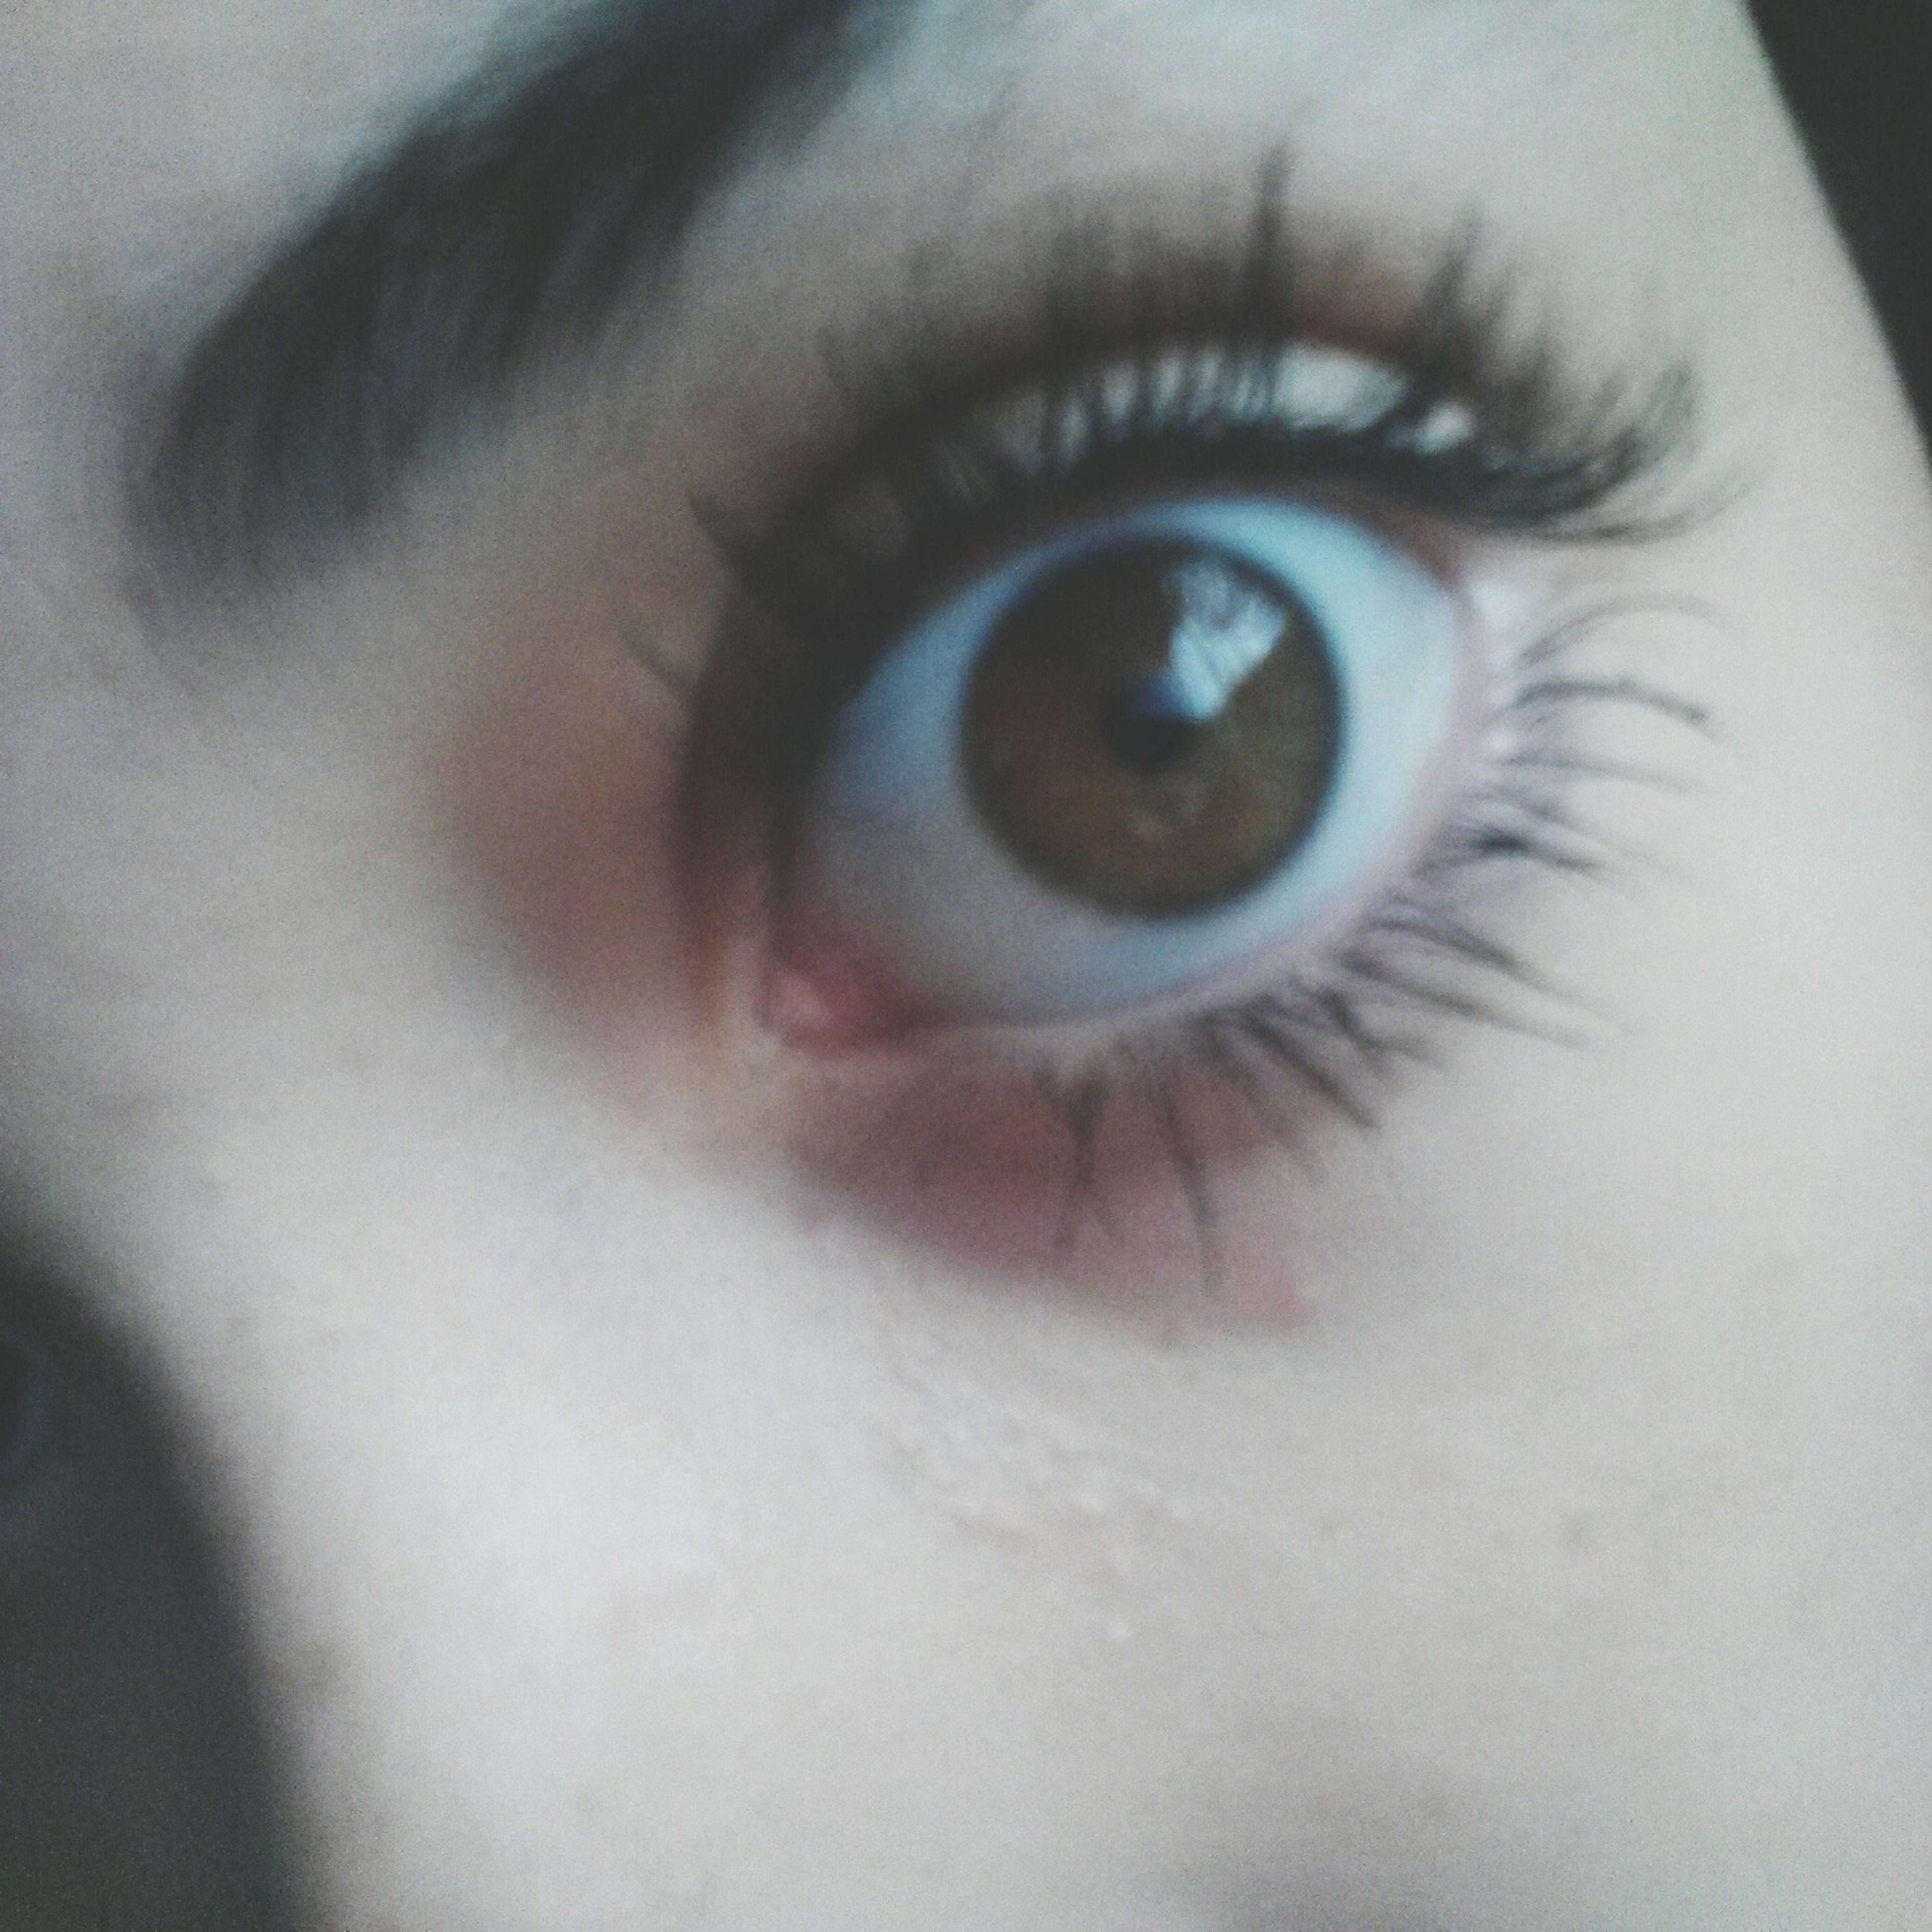 human eye, eyelash, close-up, eyesight, sensory perception, human skin, extreme close-up, indoors, part of, eyeball, iris - eye, looking at camera, extreme close up, person, lifestyles, portrait, unrecognizable person